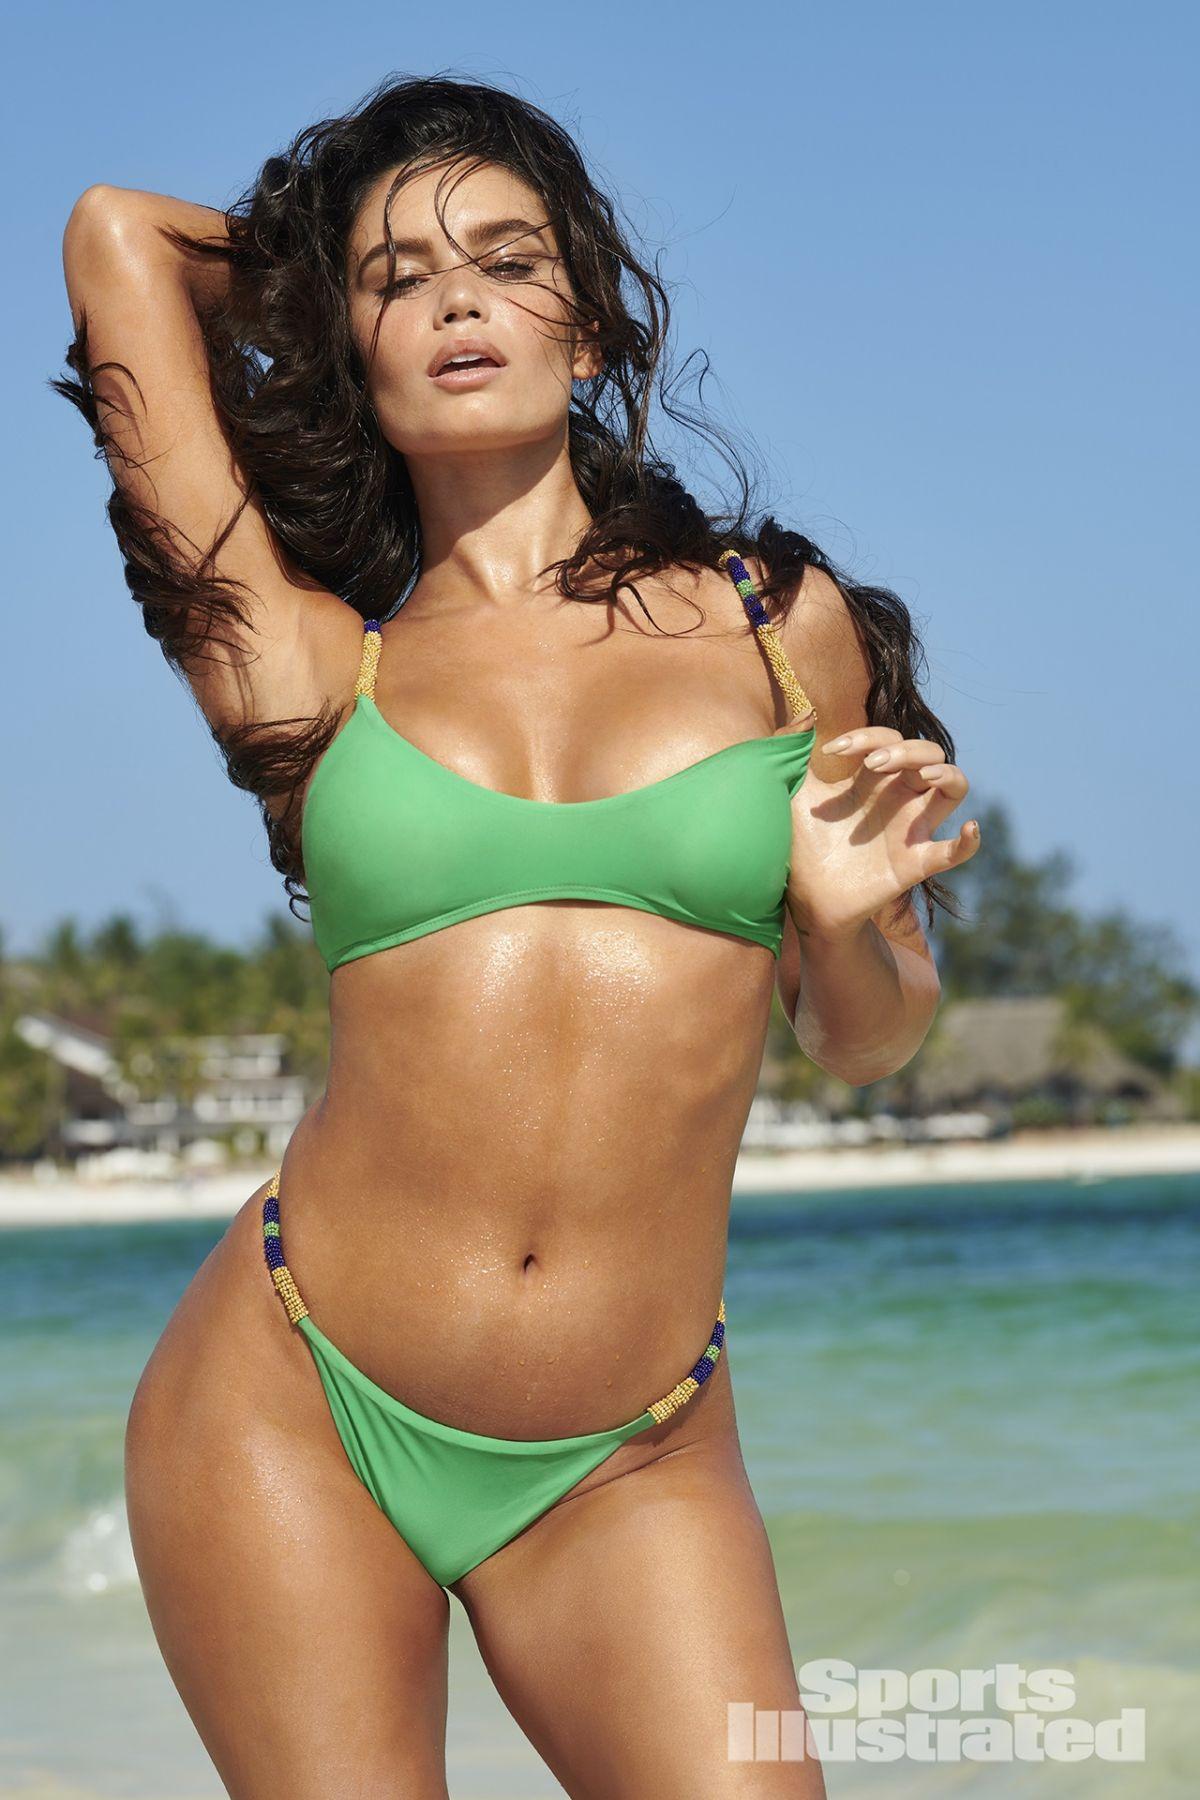 paula anne illustrated swimsuit sports si issue bikini hawtcelebs tsai yu wants paul story celebzz maxim aznude woman